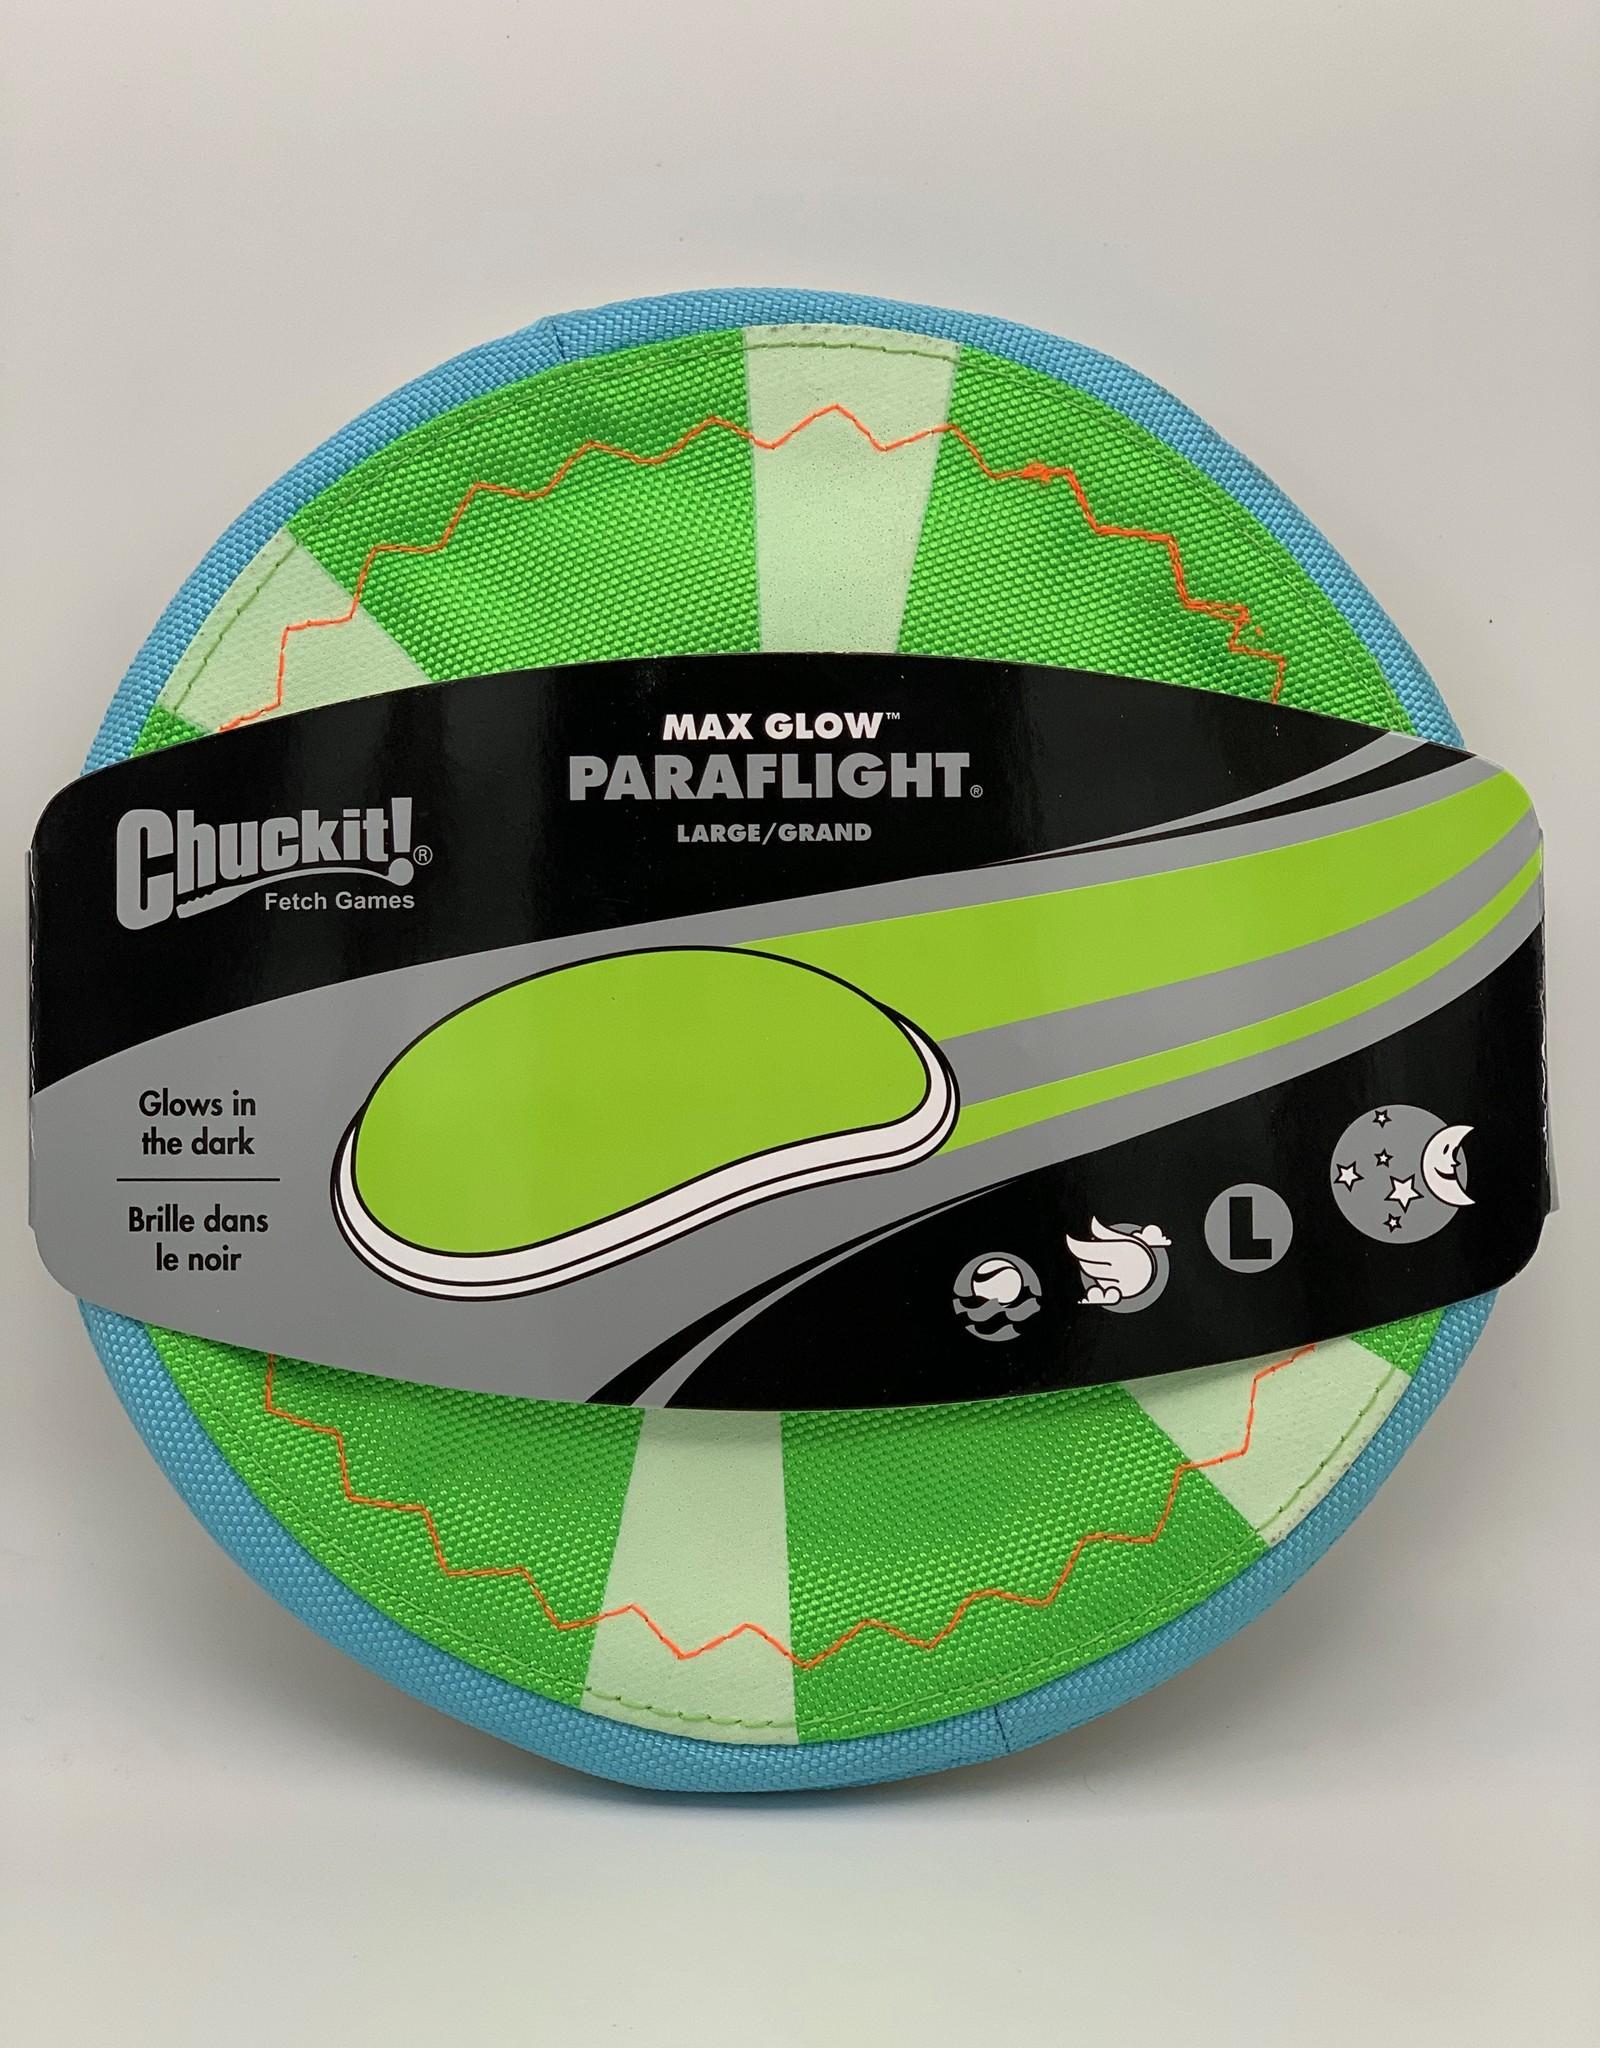 ChuckIt! Max Glow Paraflight - Large